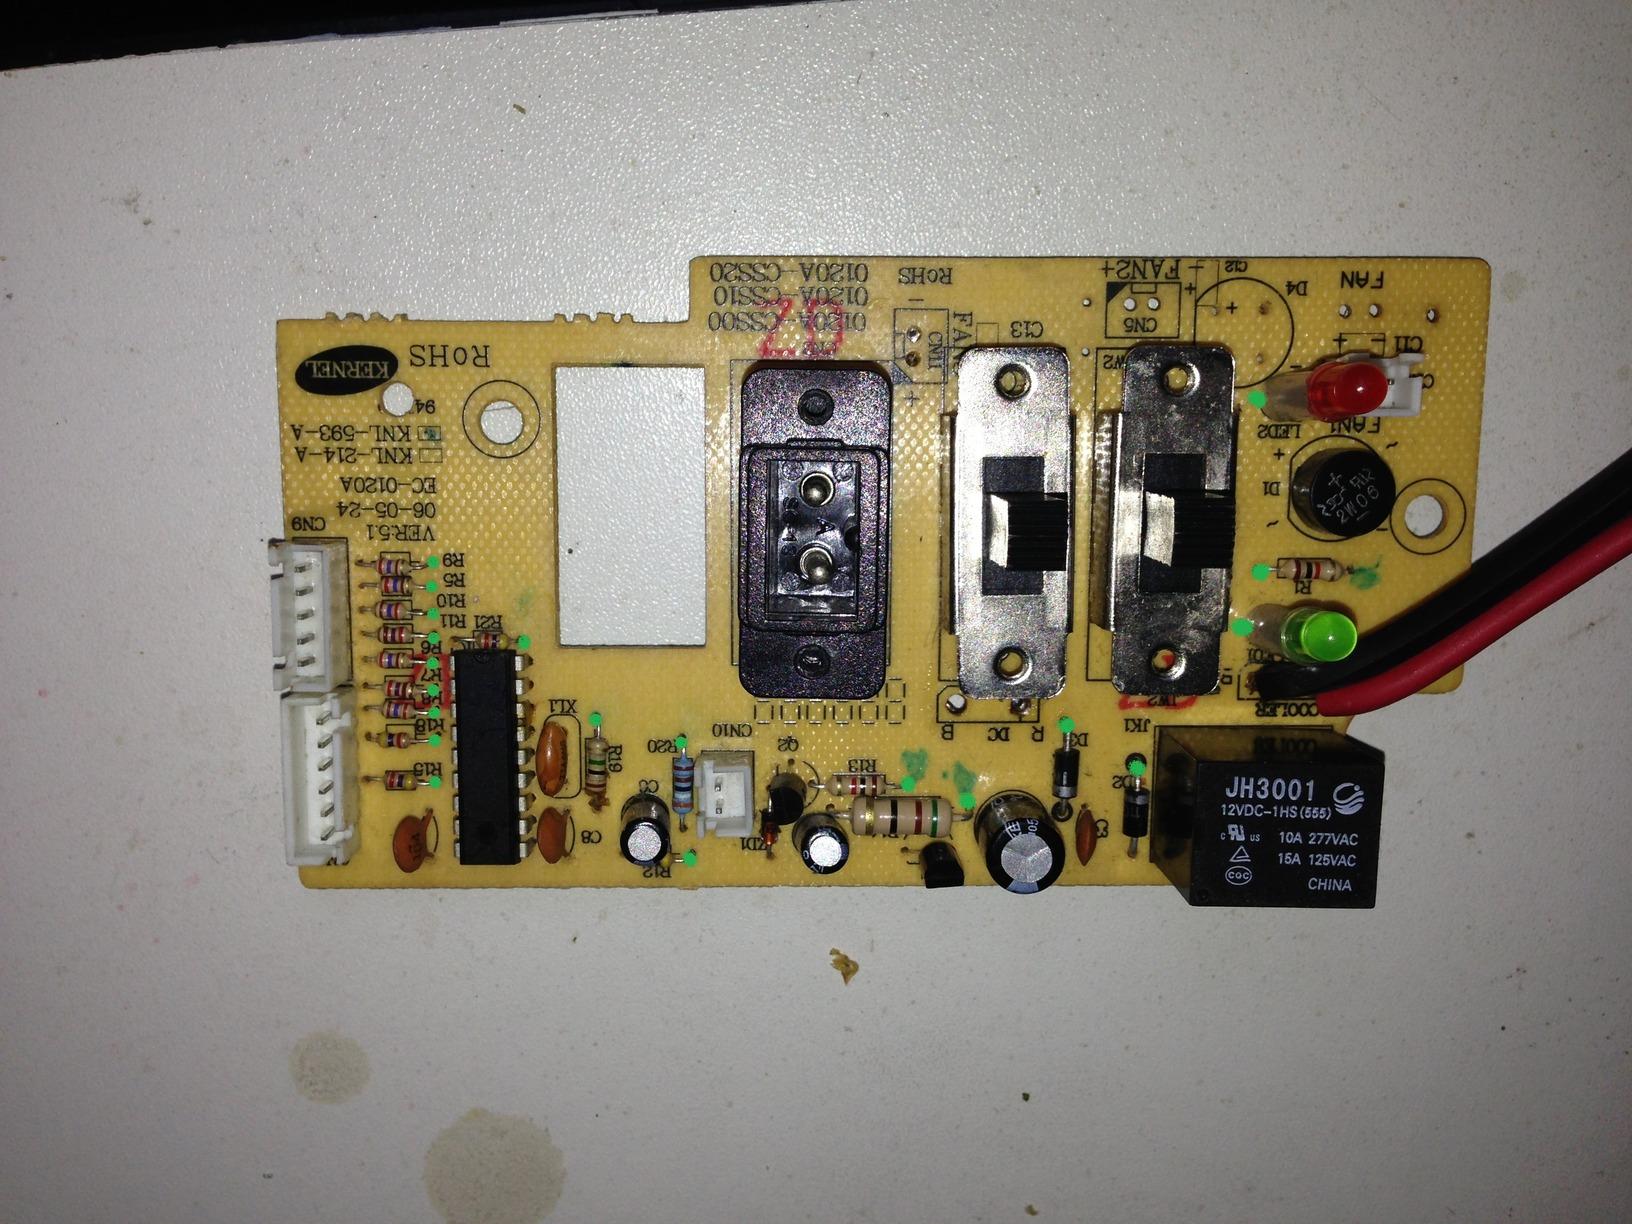 Mini Peltier Kühlschrank Kaufen : Kompressor kühlbox test v v mini kühlschränke für unterwegs